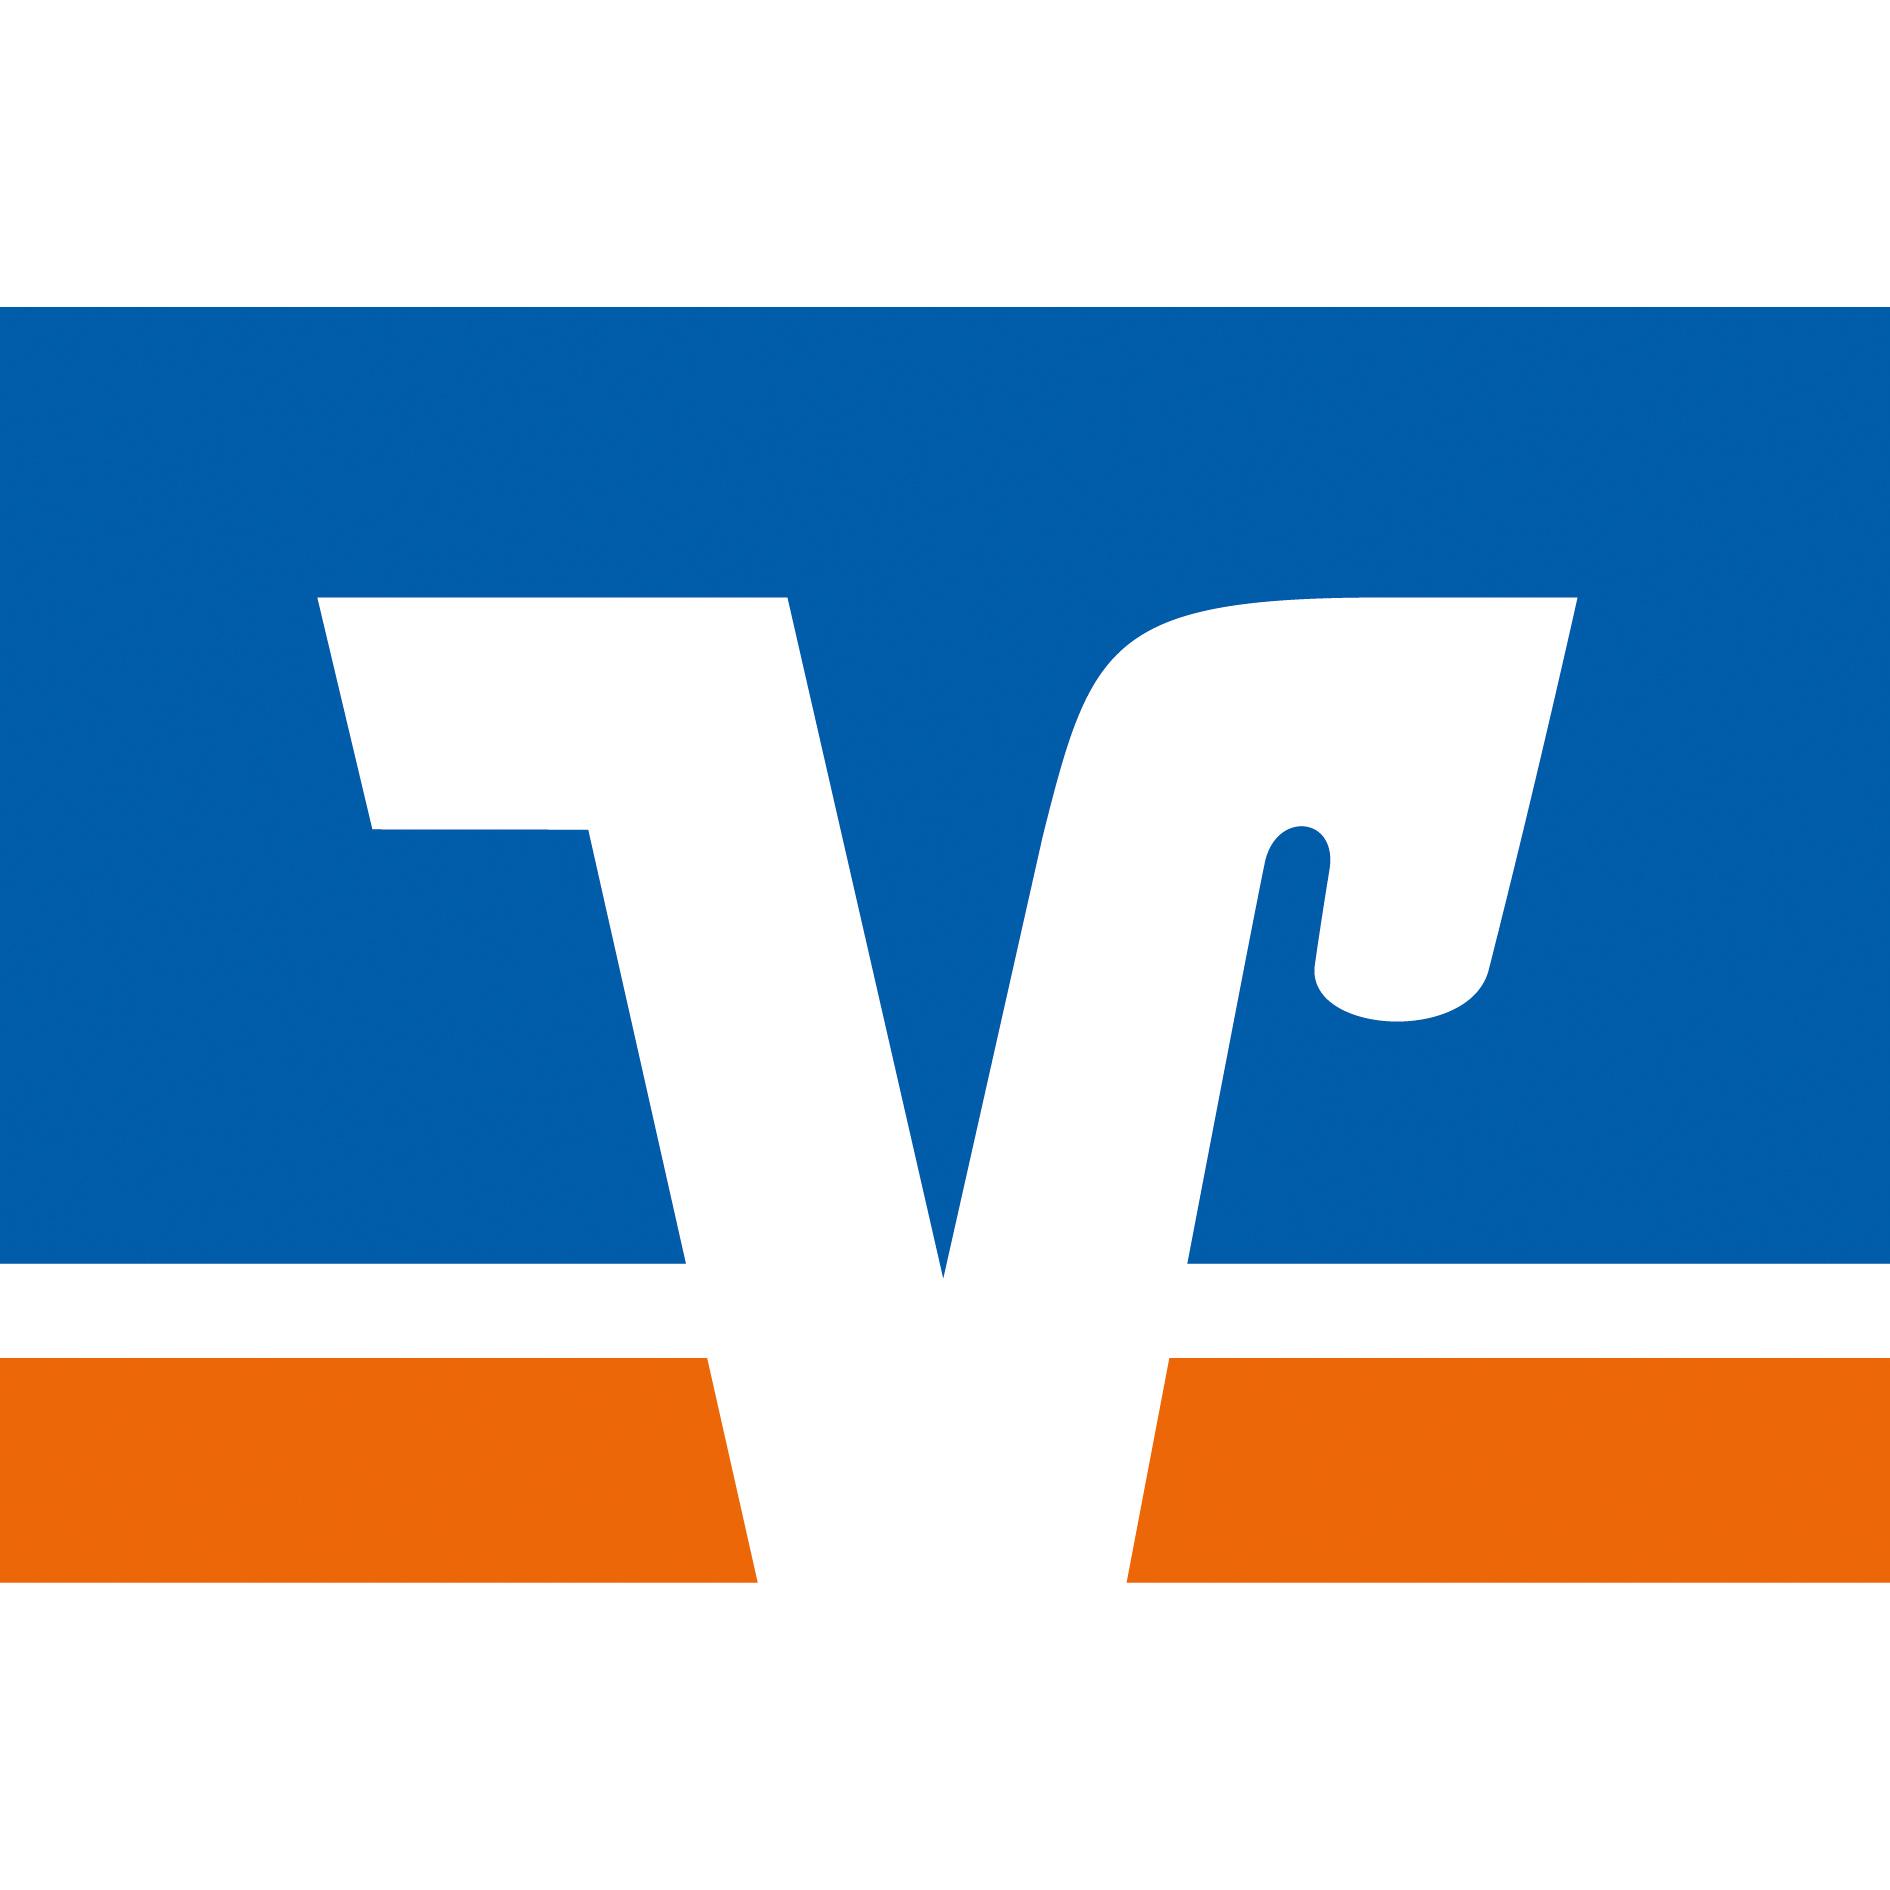 VR Immobilien GmbH, Grassau